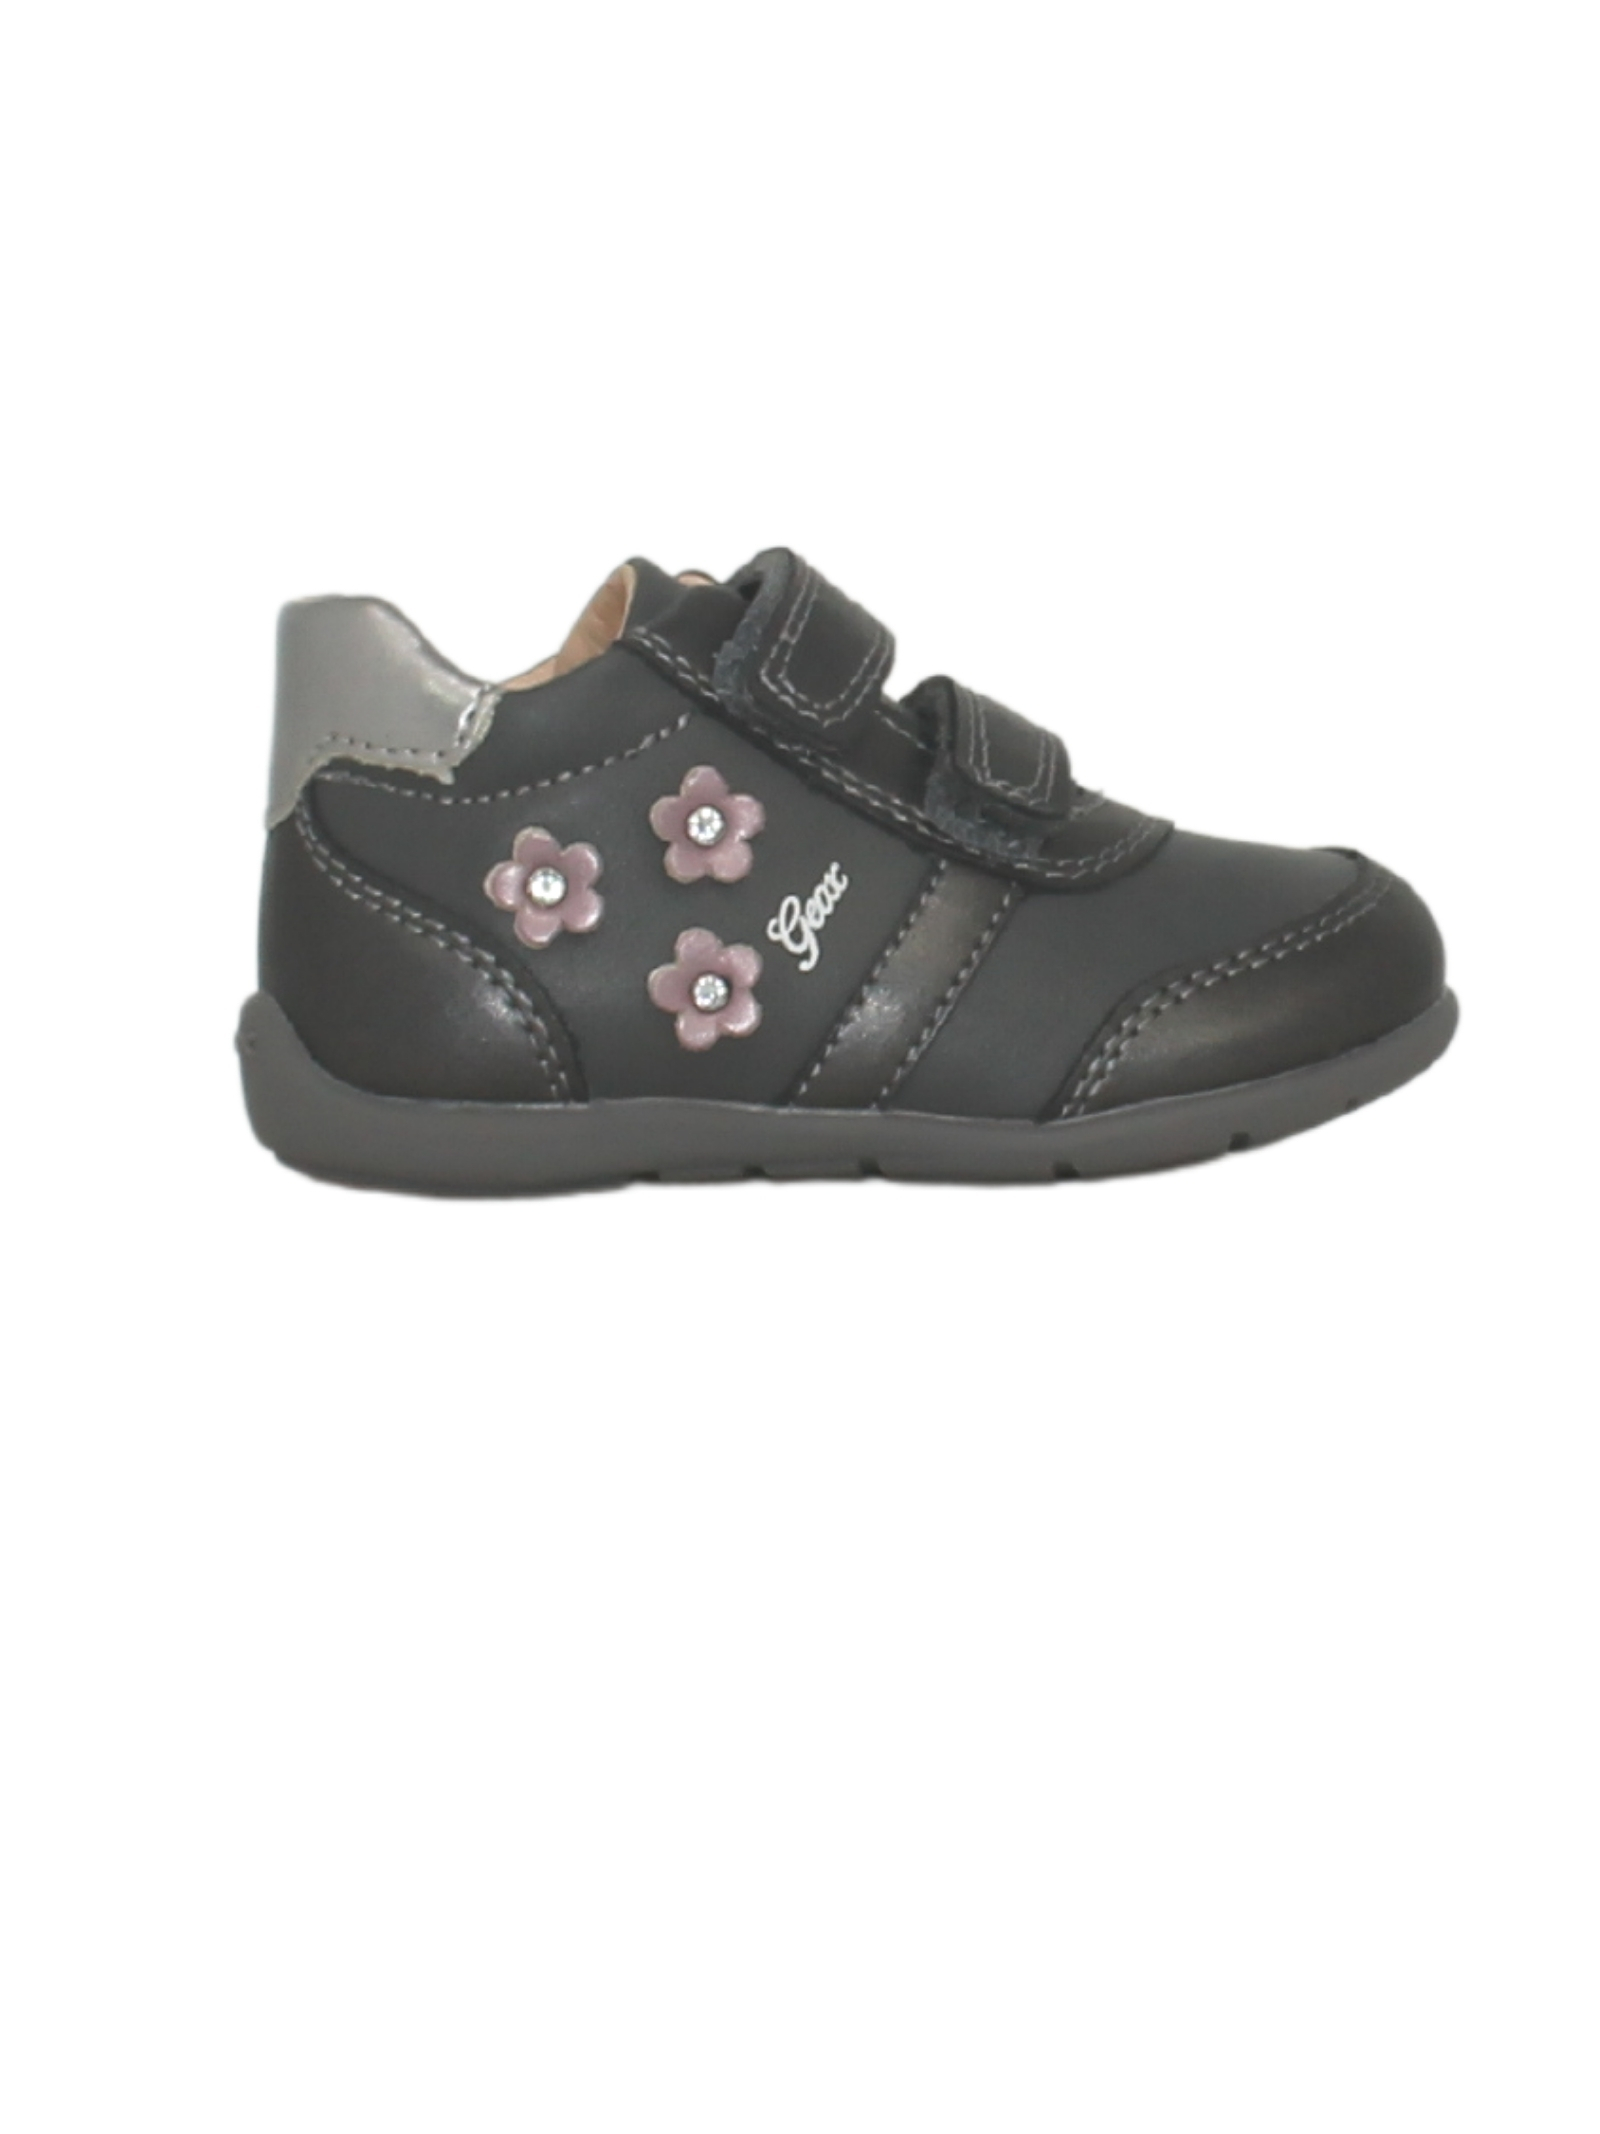 Sneakers Dk Grey Bambina GEOX KIDS   Sneakers   B161QB0NFBCC9002